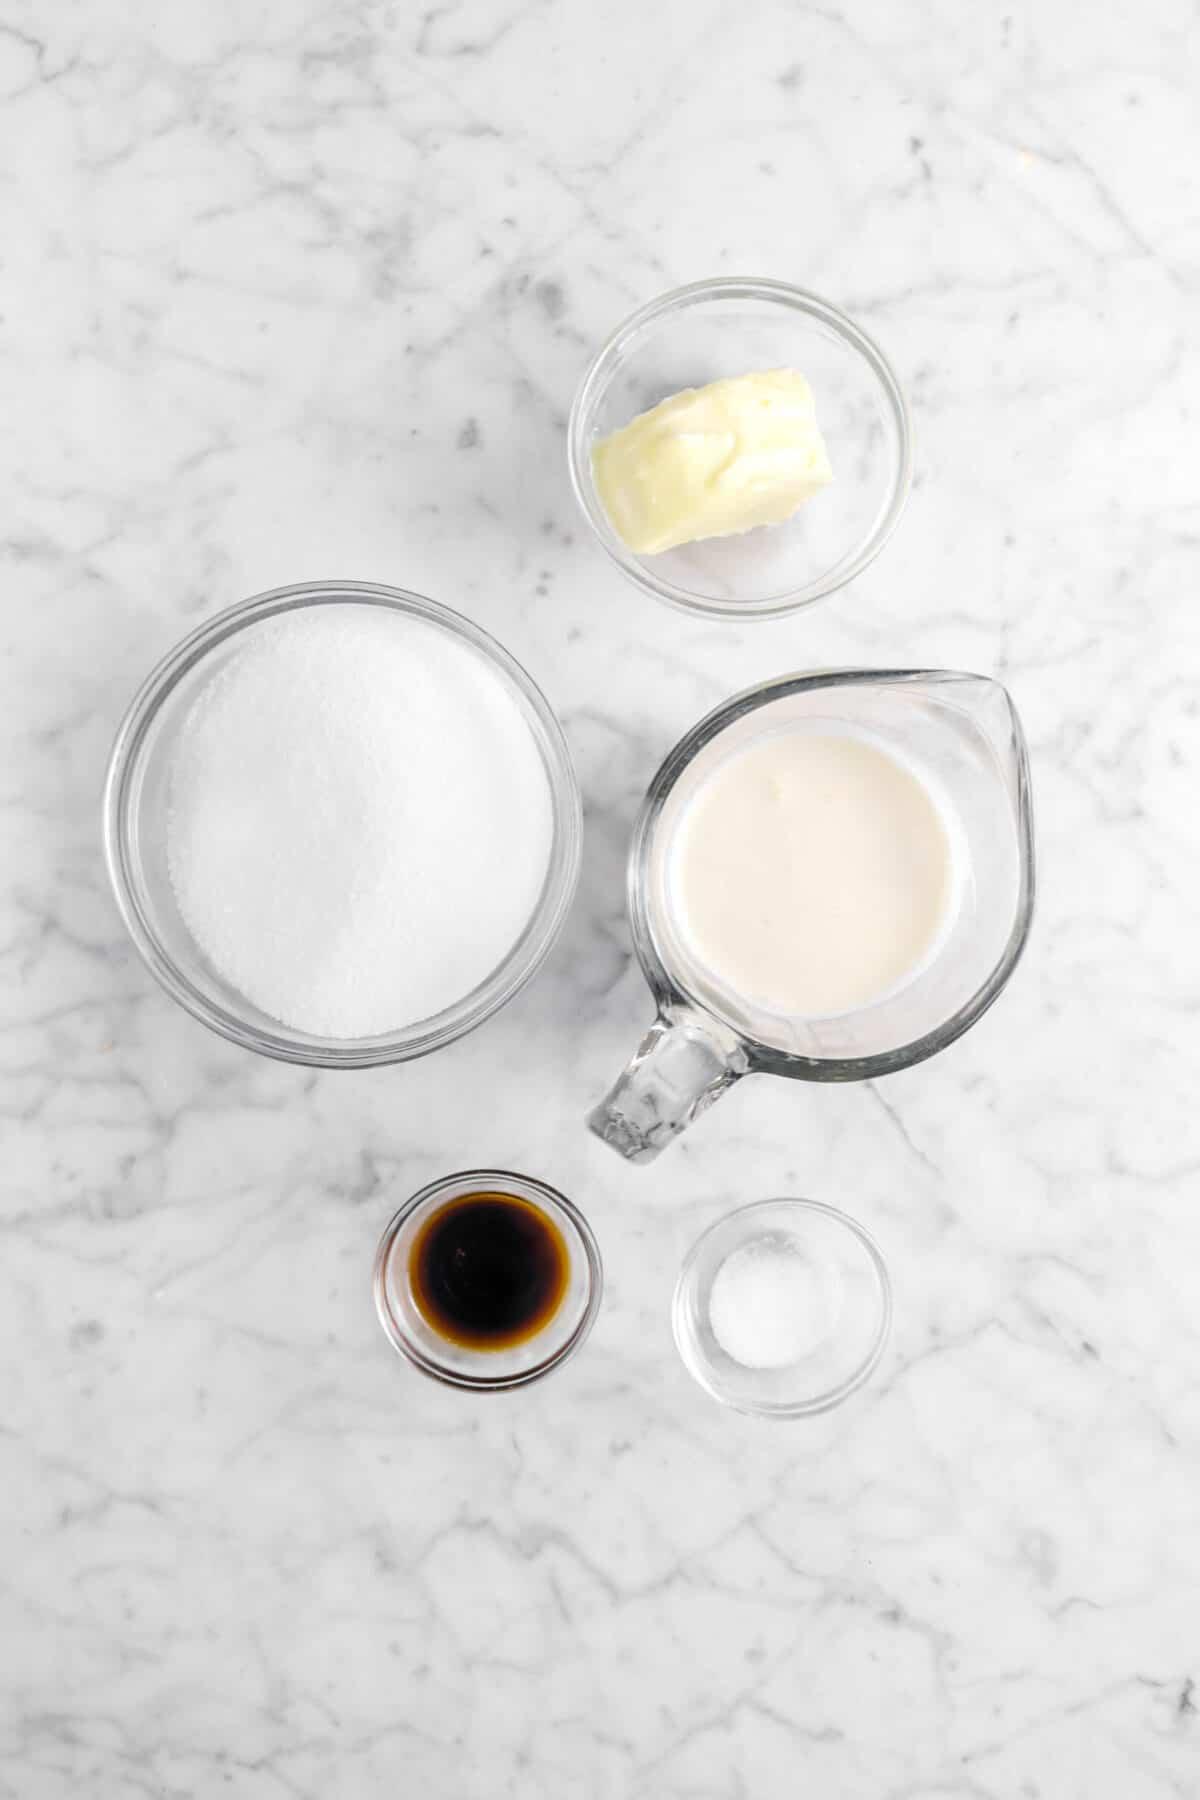 butter, sugar, cream, vanilla, and salt on marble counter